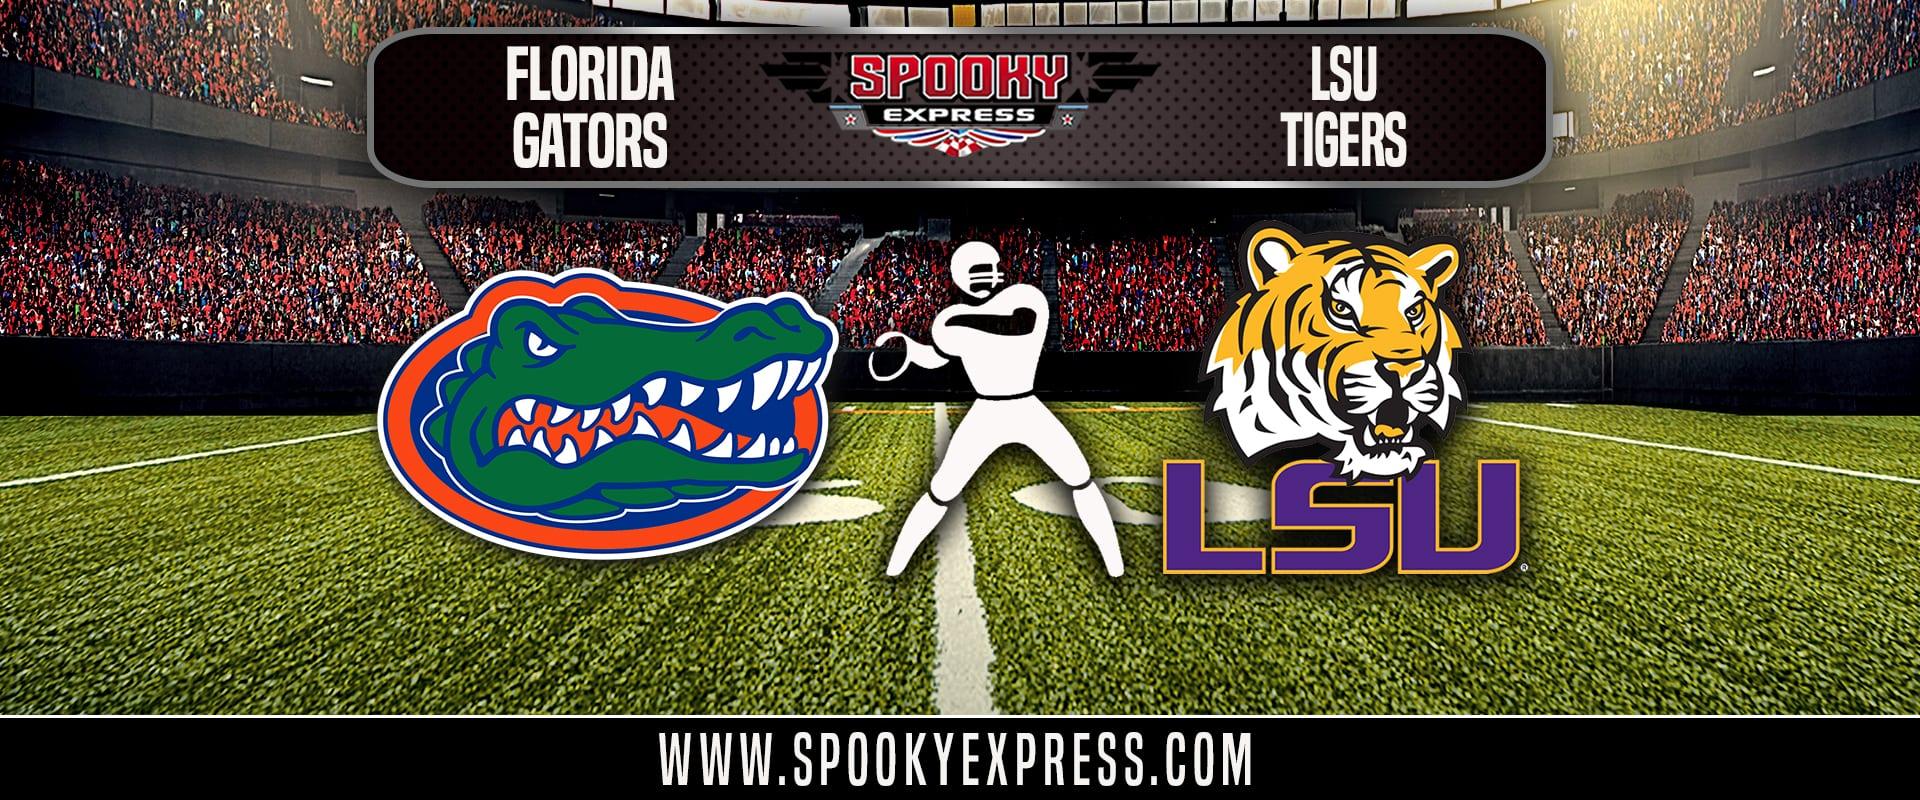 college football betting preview lsu tigers vs florida gators